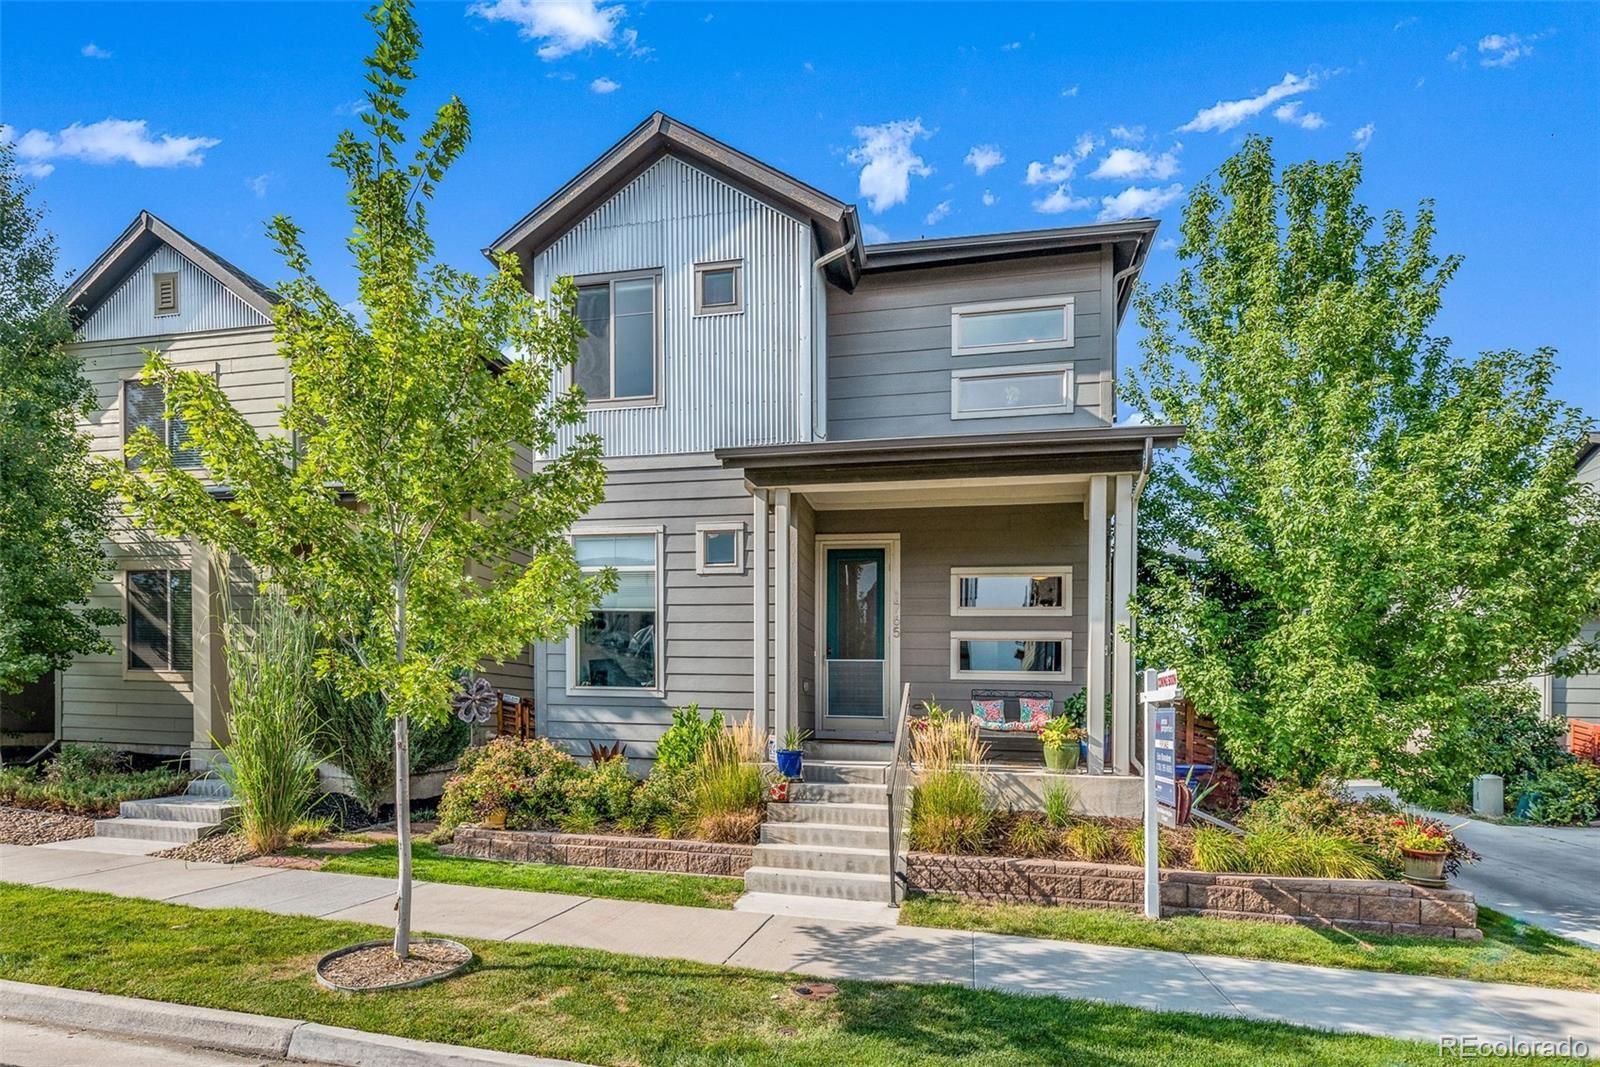 1765 W 67th Place, Denver, CO 80221 - MLS#: 4230547